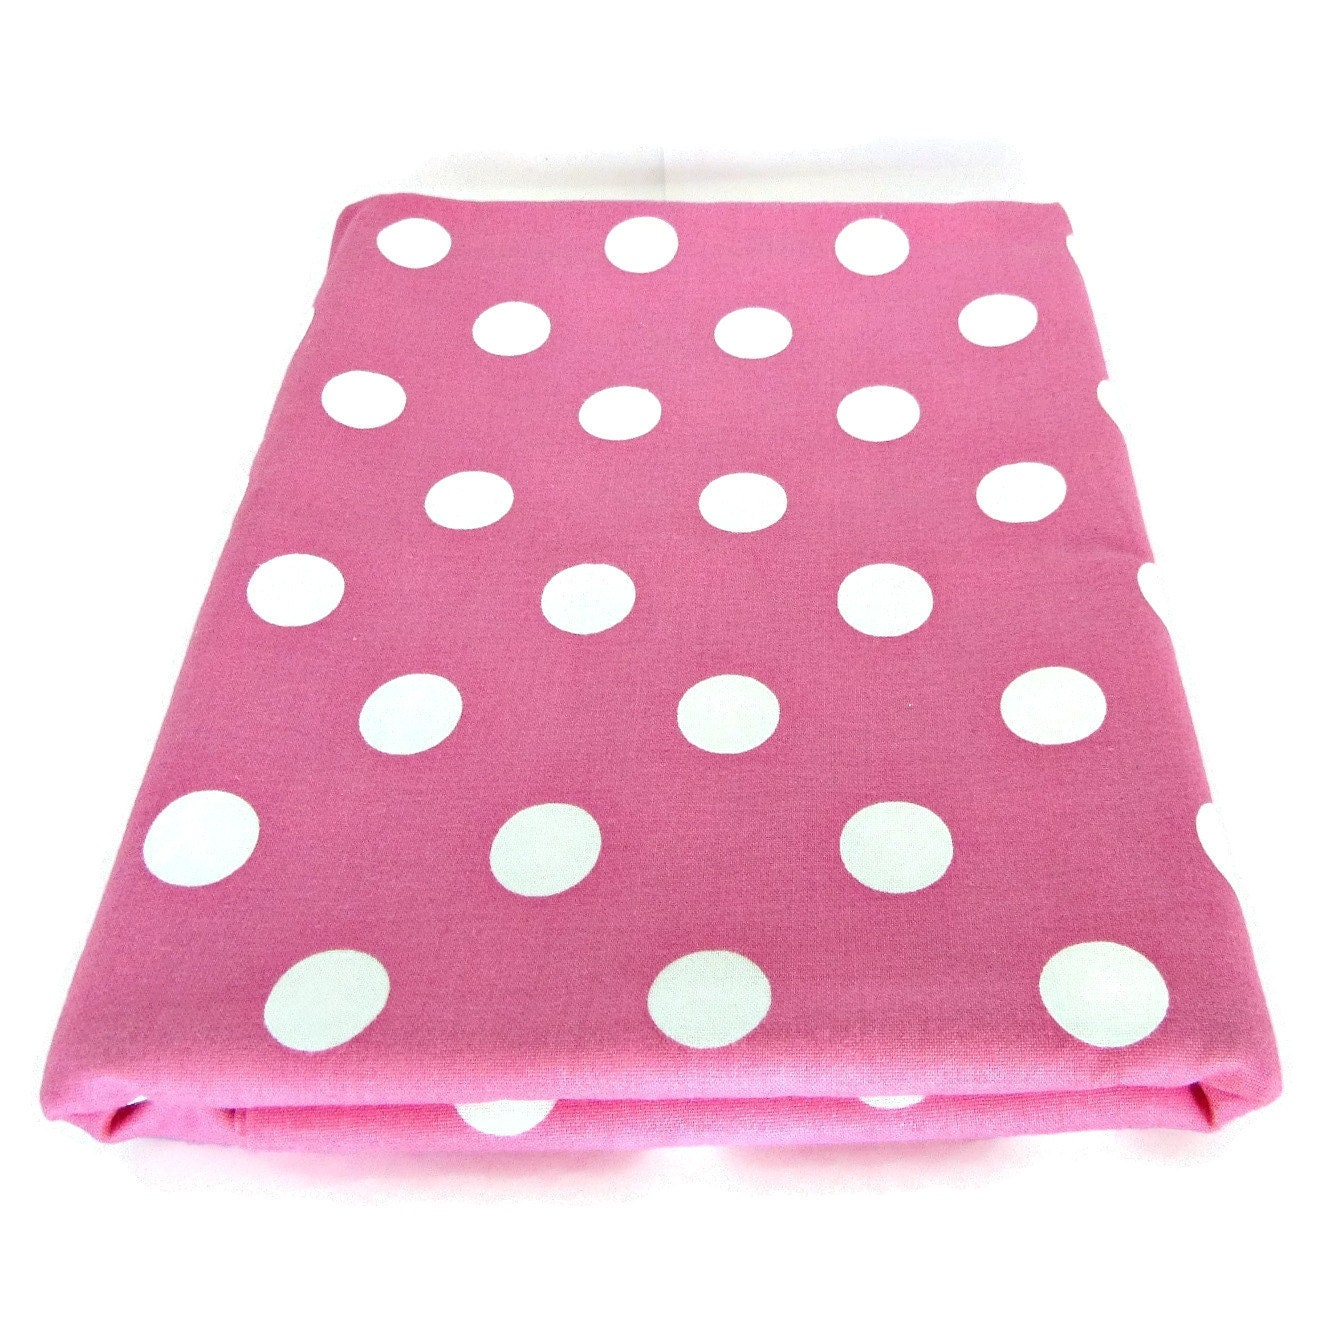 hot pink polka dot fabric pink dots fabric polka dot. Black Bedroom Furniture Sets. Home Design Ideas